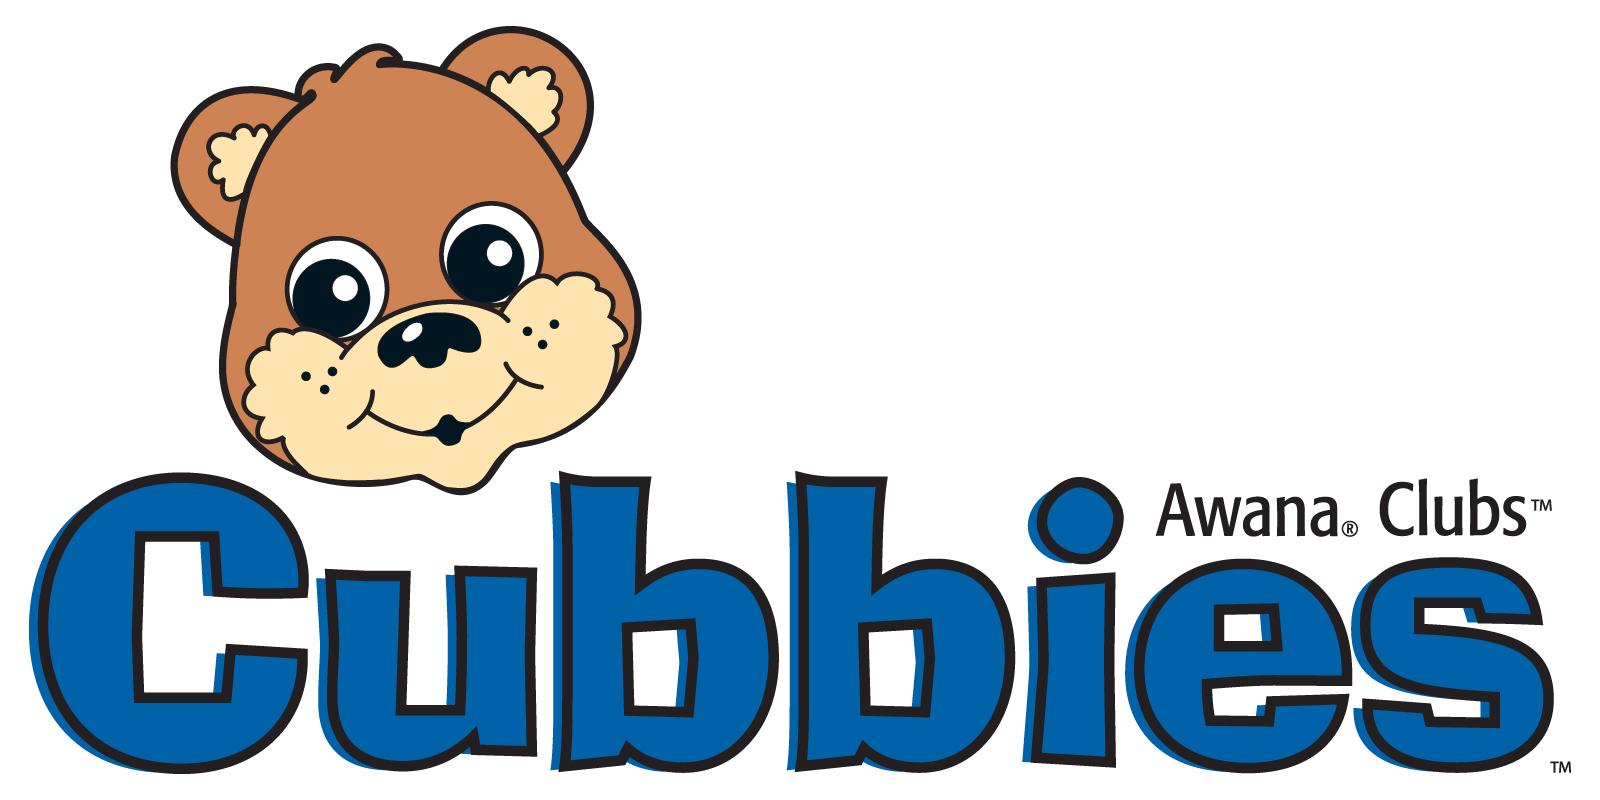 Tu0026Tlogo2008rgb sp cubbies logo - Awana PNG Free